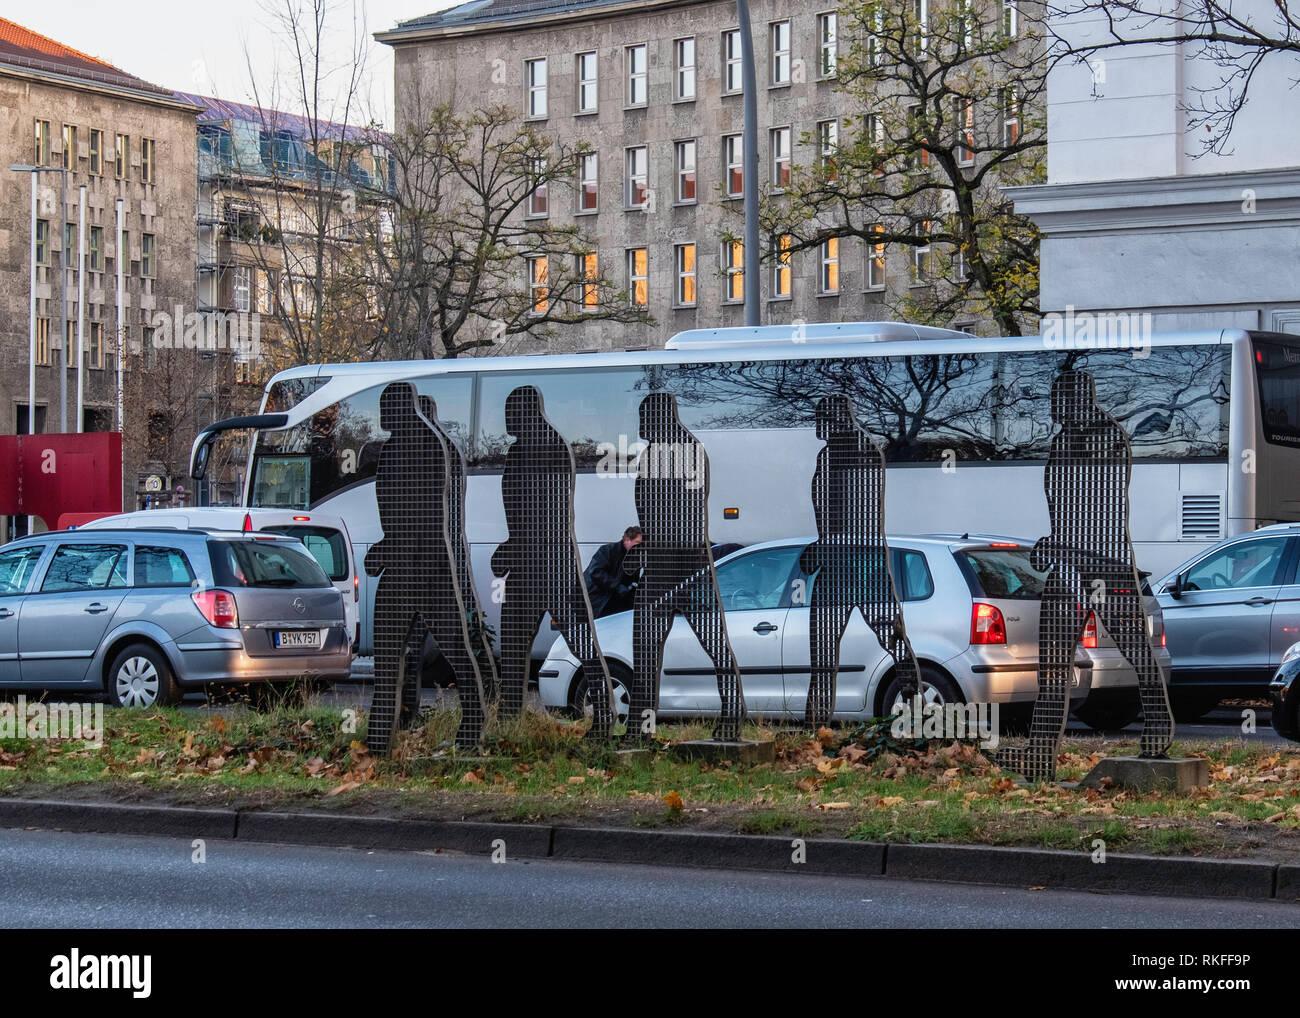 Berlin,Wilmersdorf, Scuplture on traffic island In Hohenzollerndamm, Six Men walking. Metal mesh public artwork - Stock Image